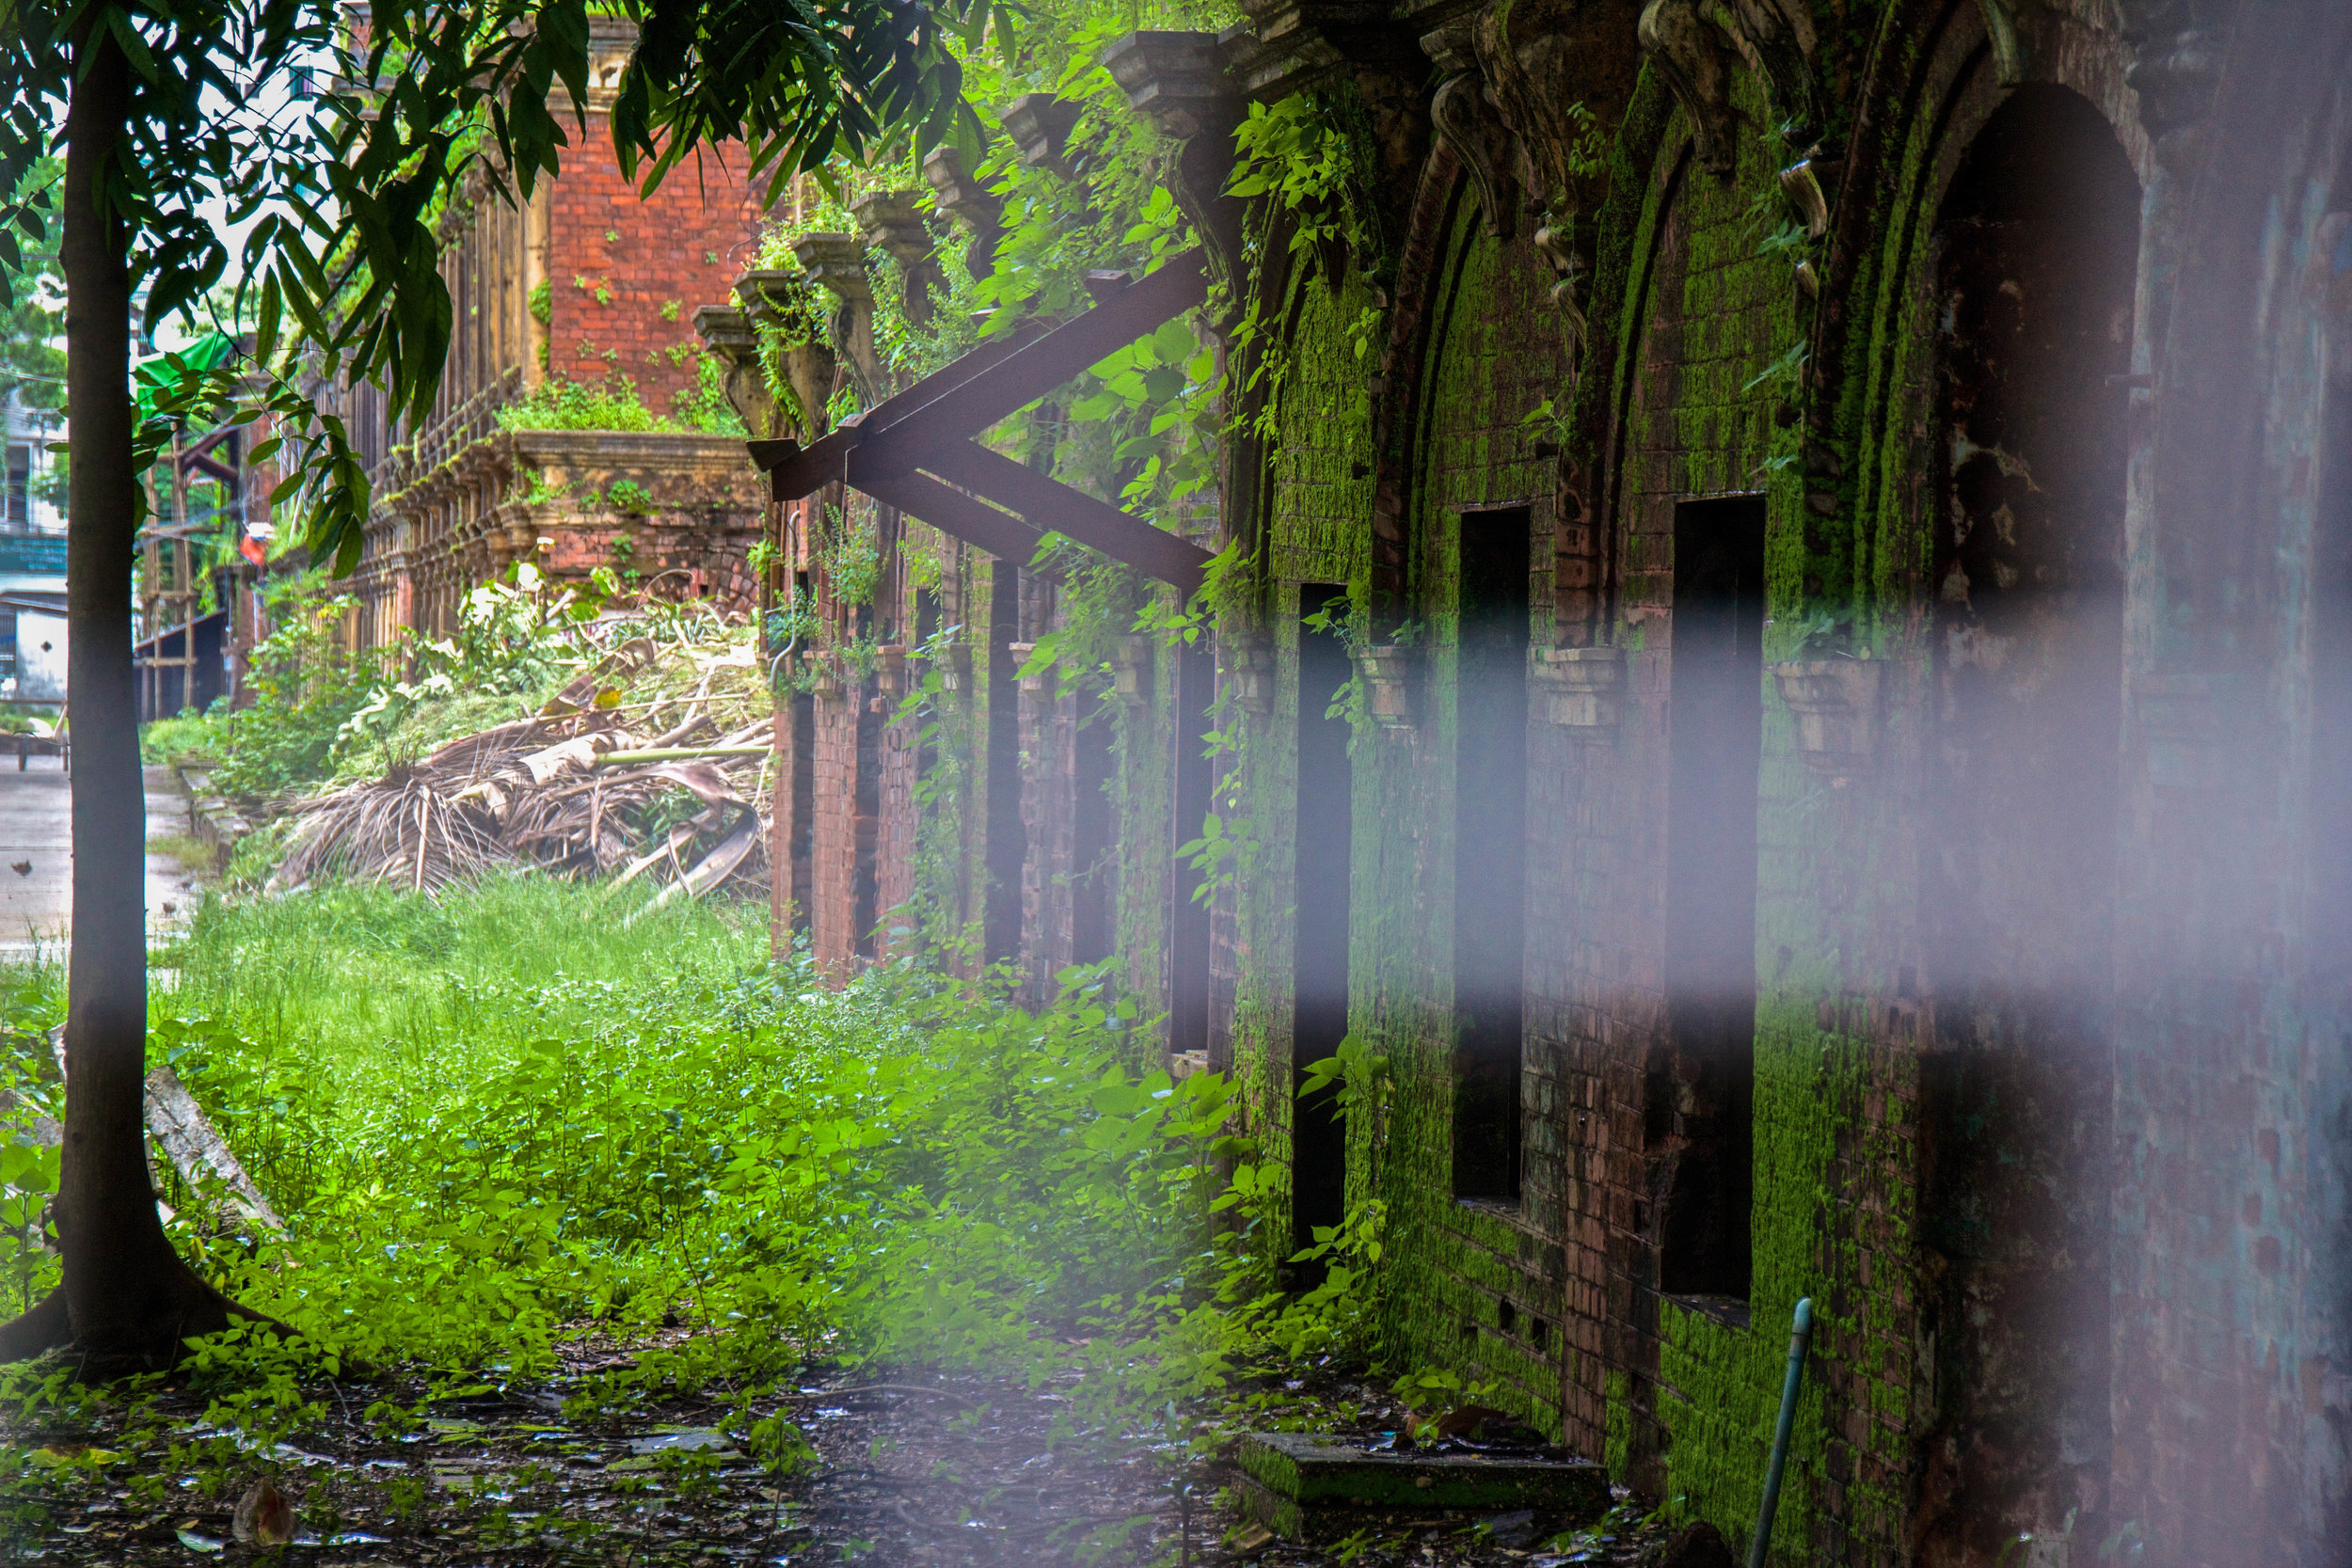 rangoon burma yangon myanmar 10-2.jpg